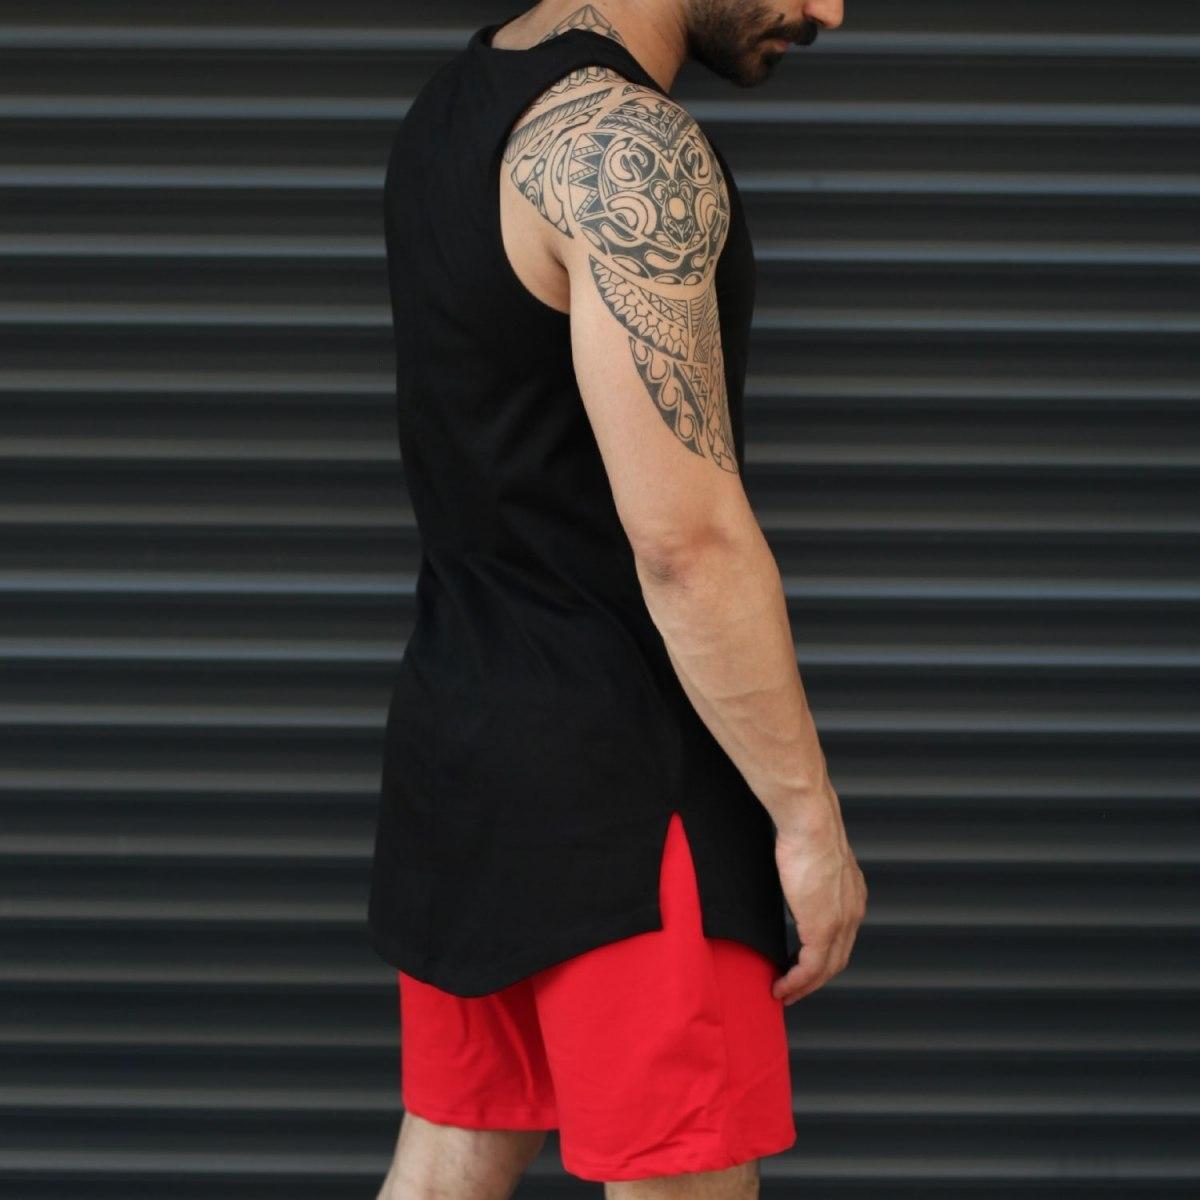 Men's Athletic Sleeveless Tall Tank Top Black Mv Premium Brand - 2